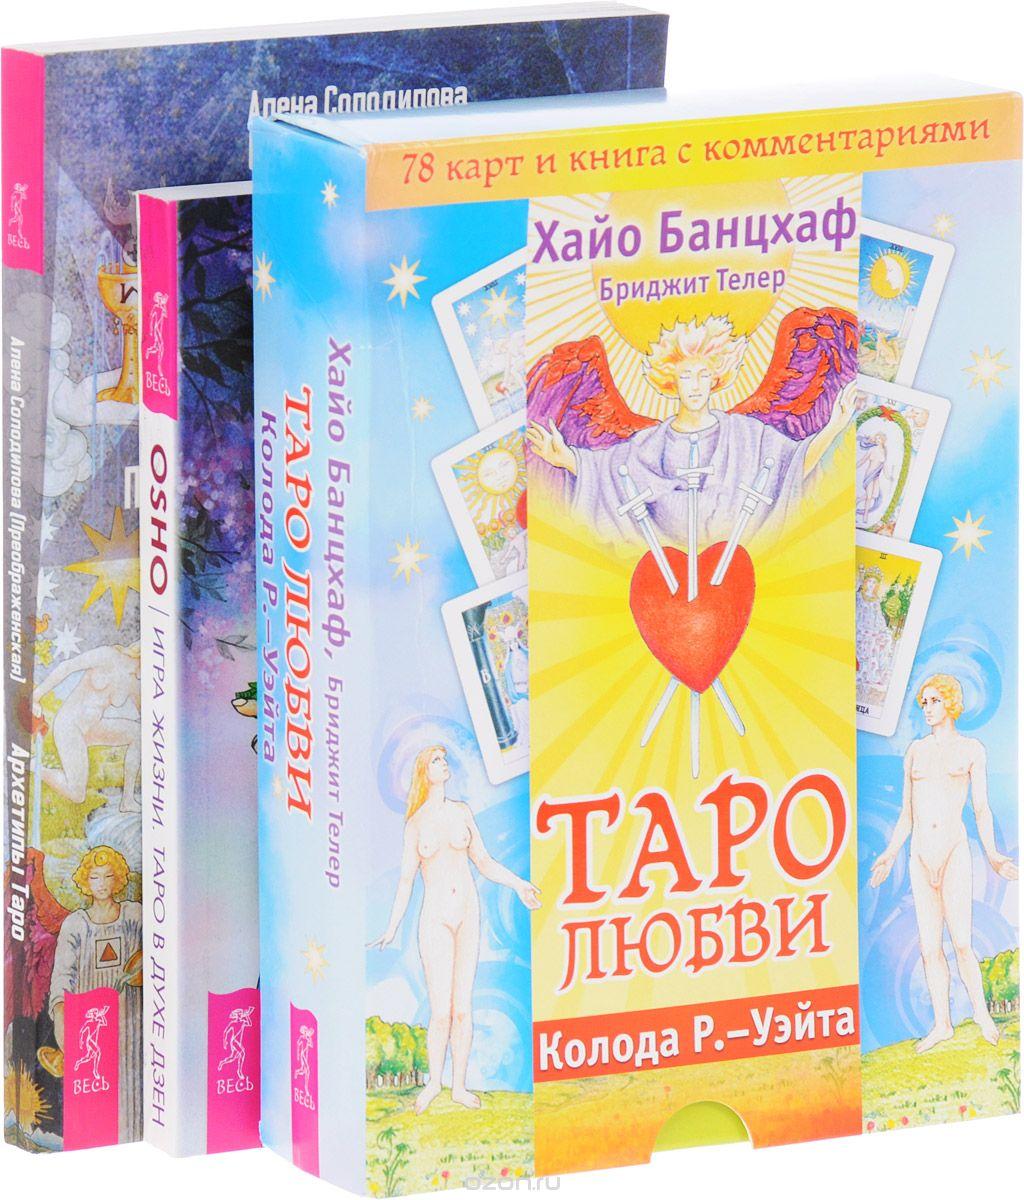 Раджниш Ошо: Игра жизни. Архетипы Таро. Таро любви (комплект из 3 книг + 78 карт)